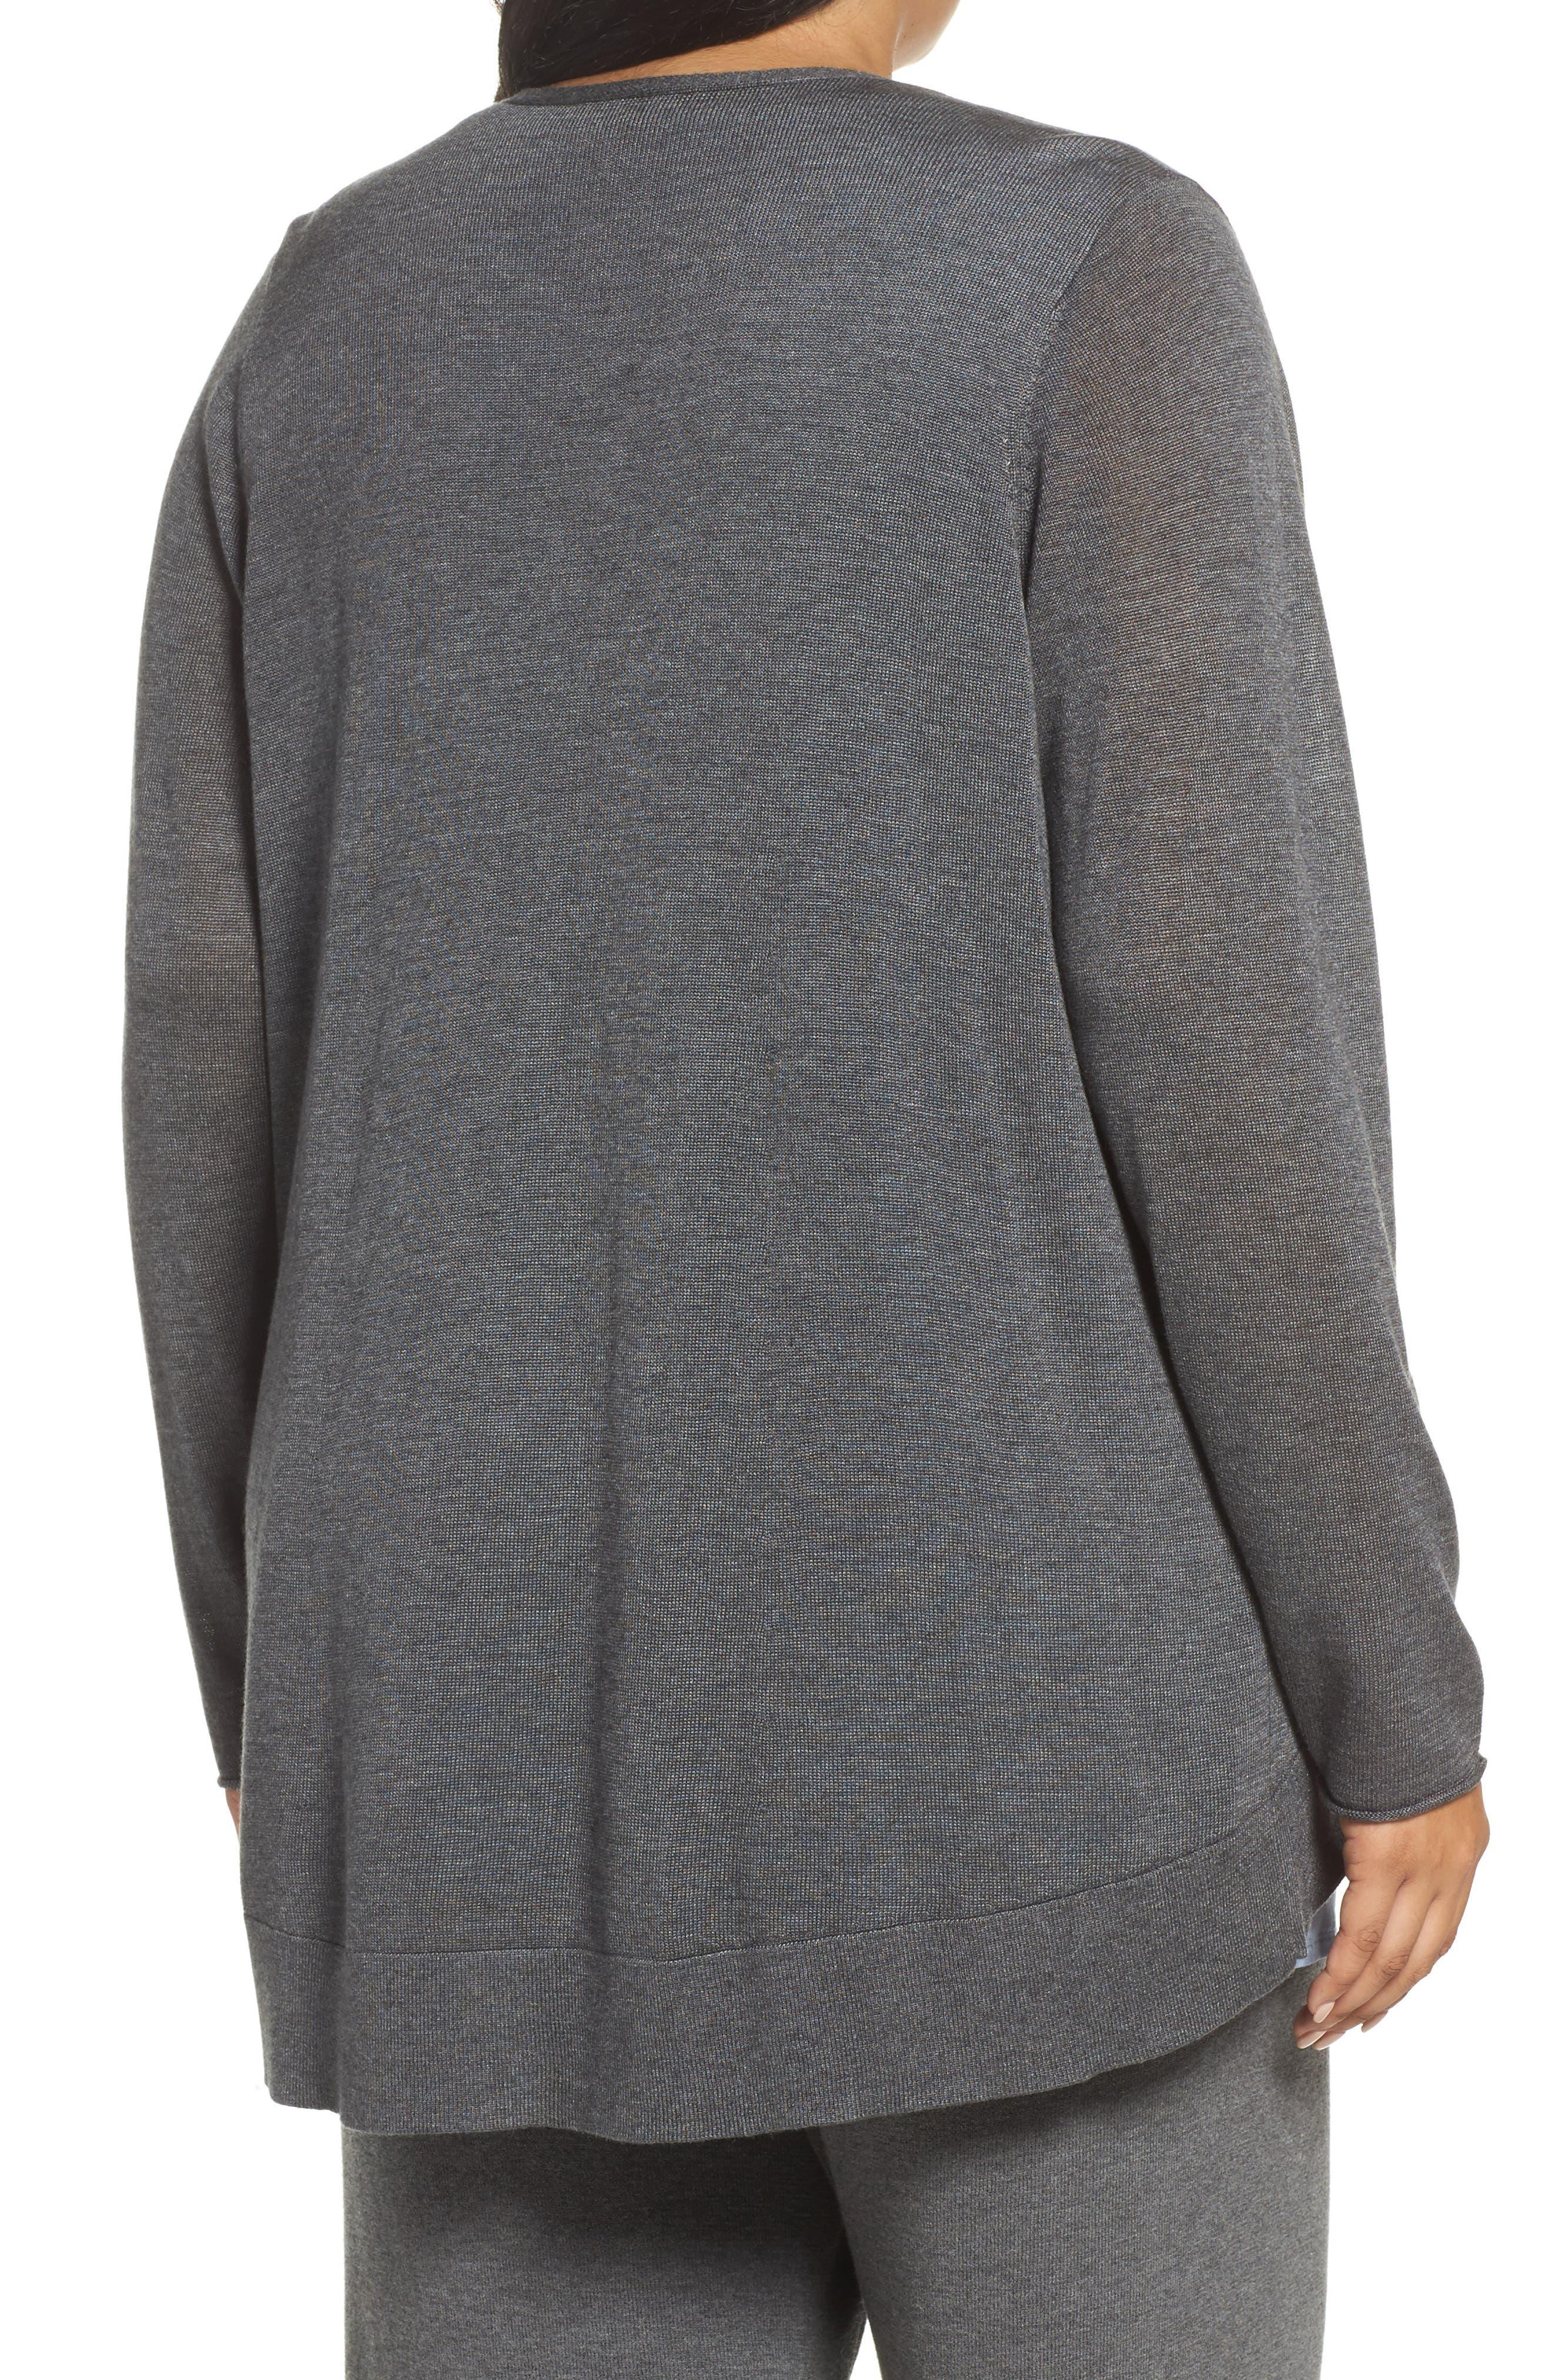 Alternate Image 2  - Eileen Fisher Slouchy Tencel® Blend Cardigan (Plus Size)